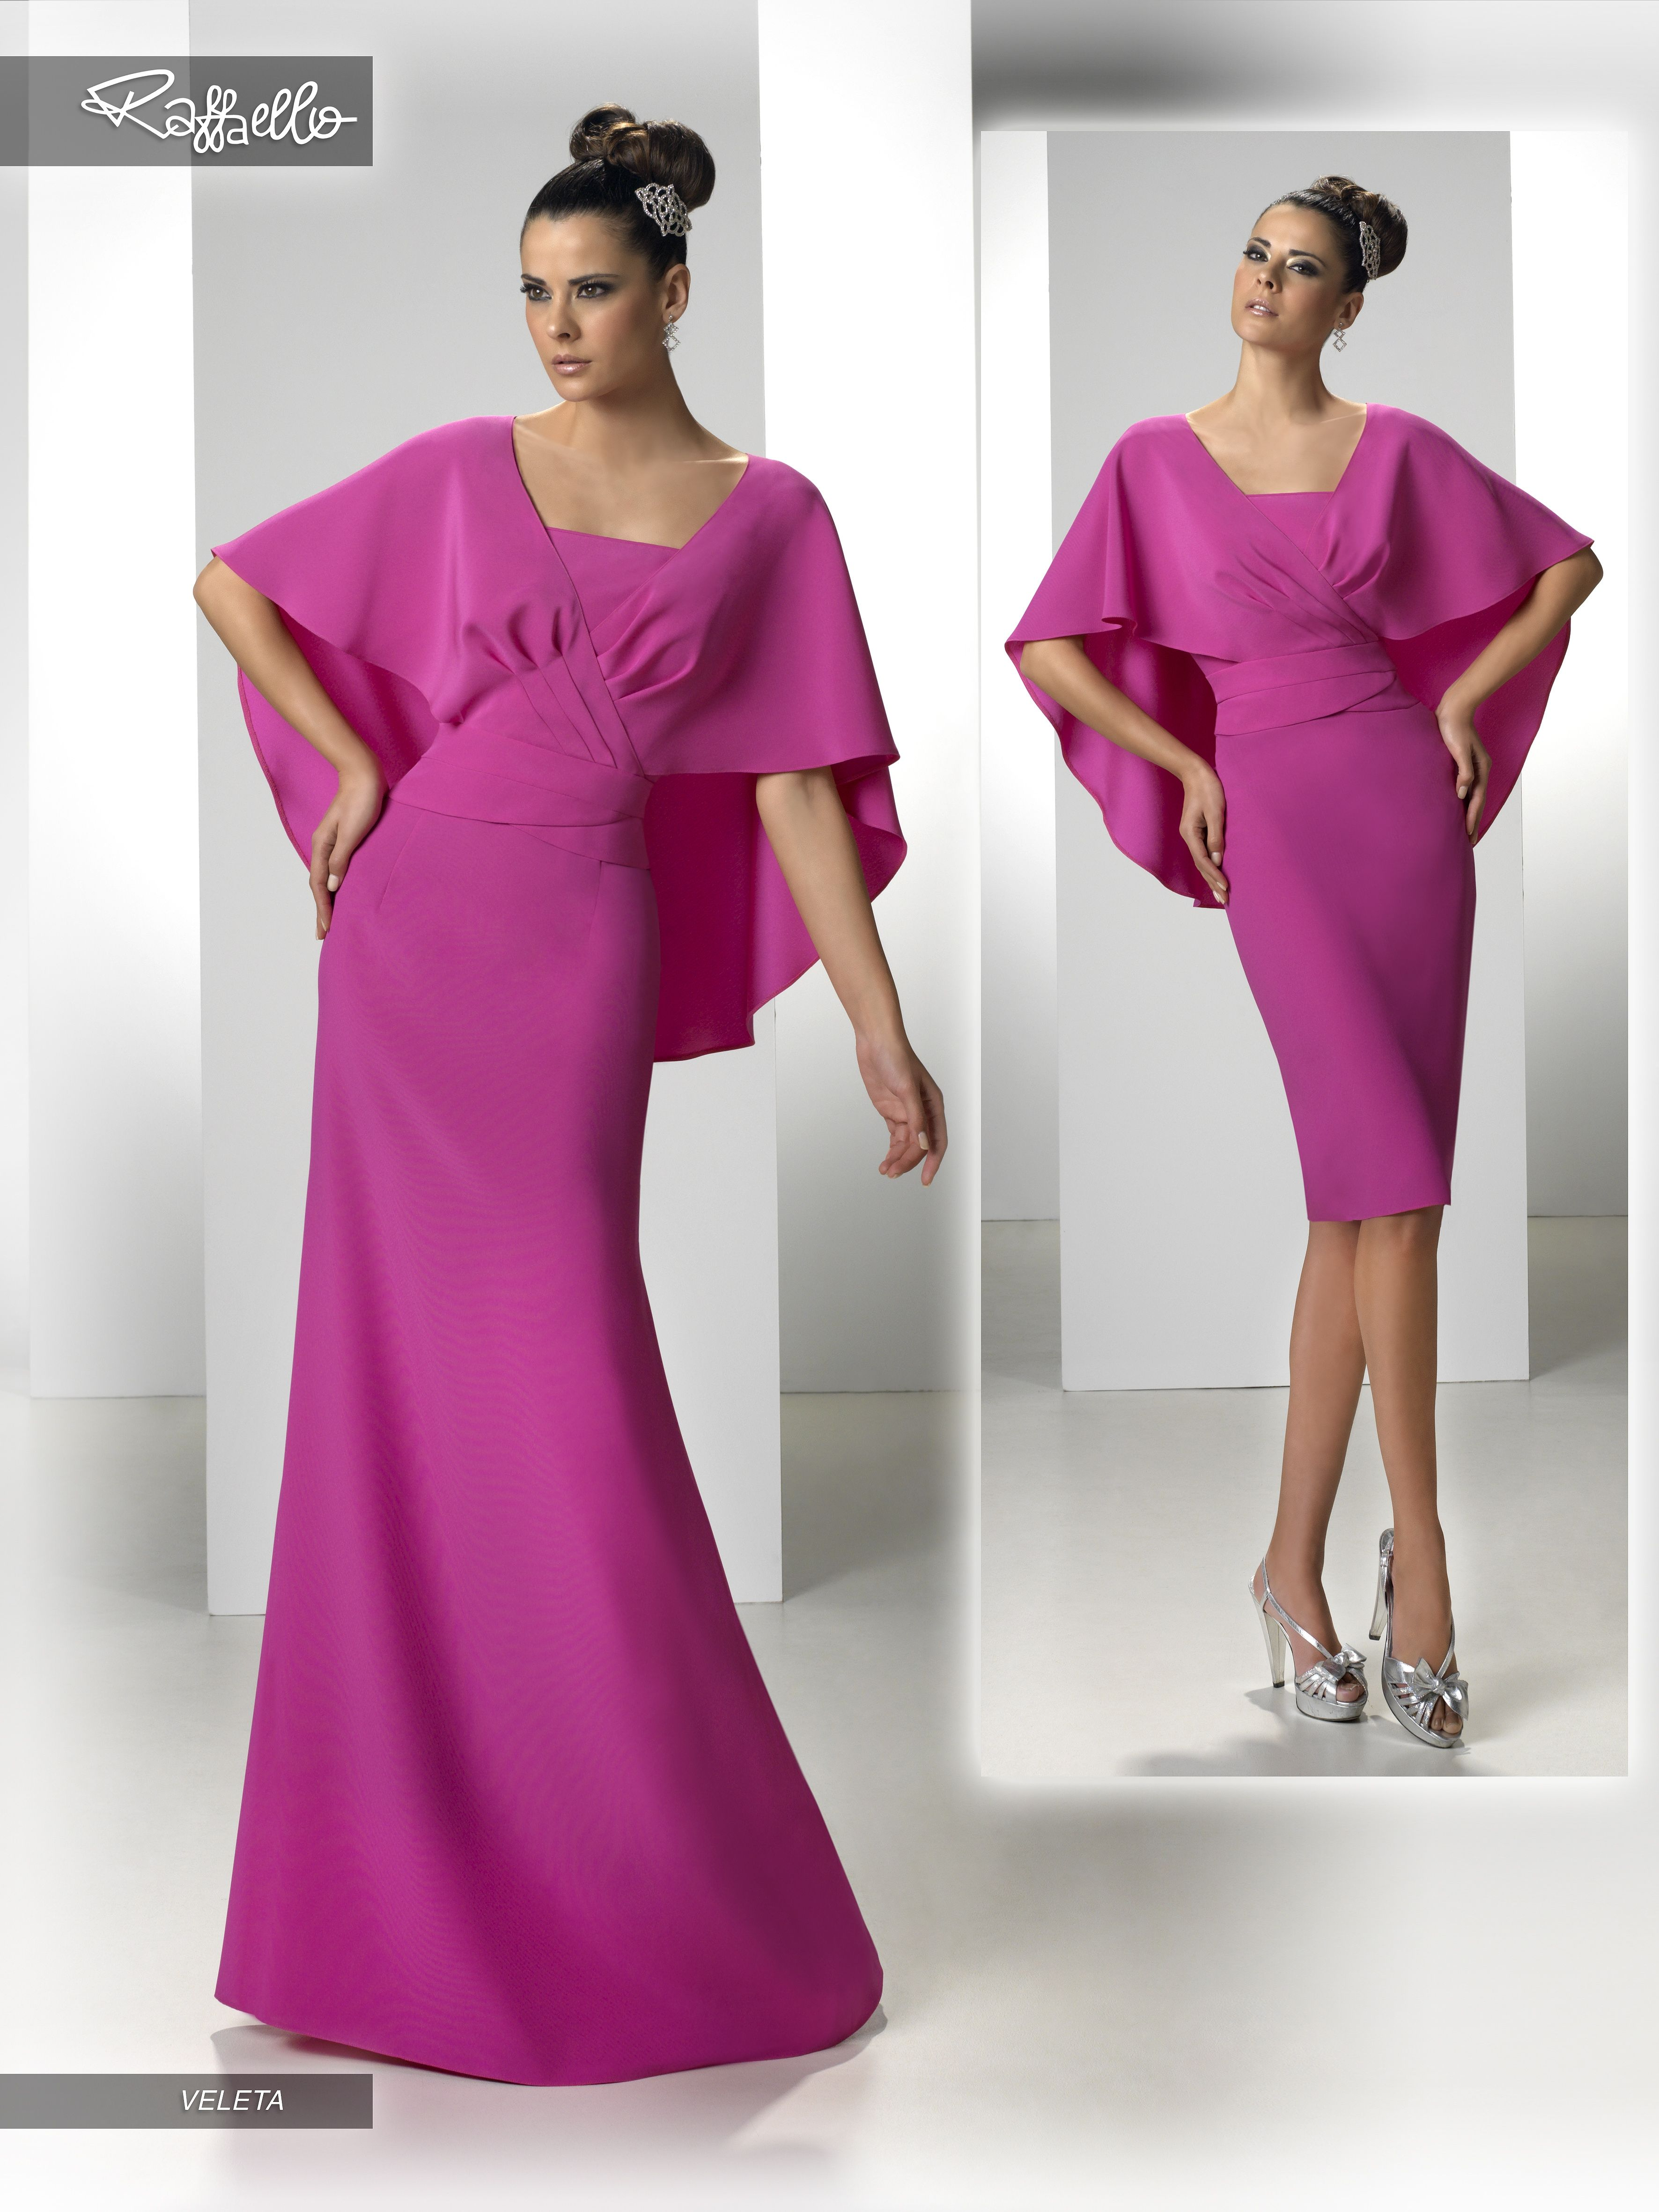 VELETA (Vestido de Fiesta). Diseñador: Raffaello. ... | Vestidos de ...